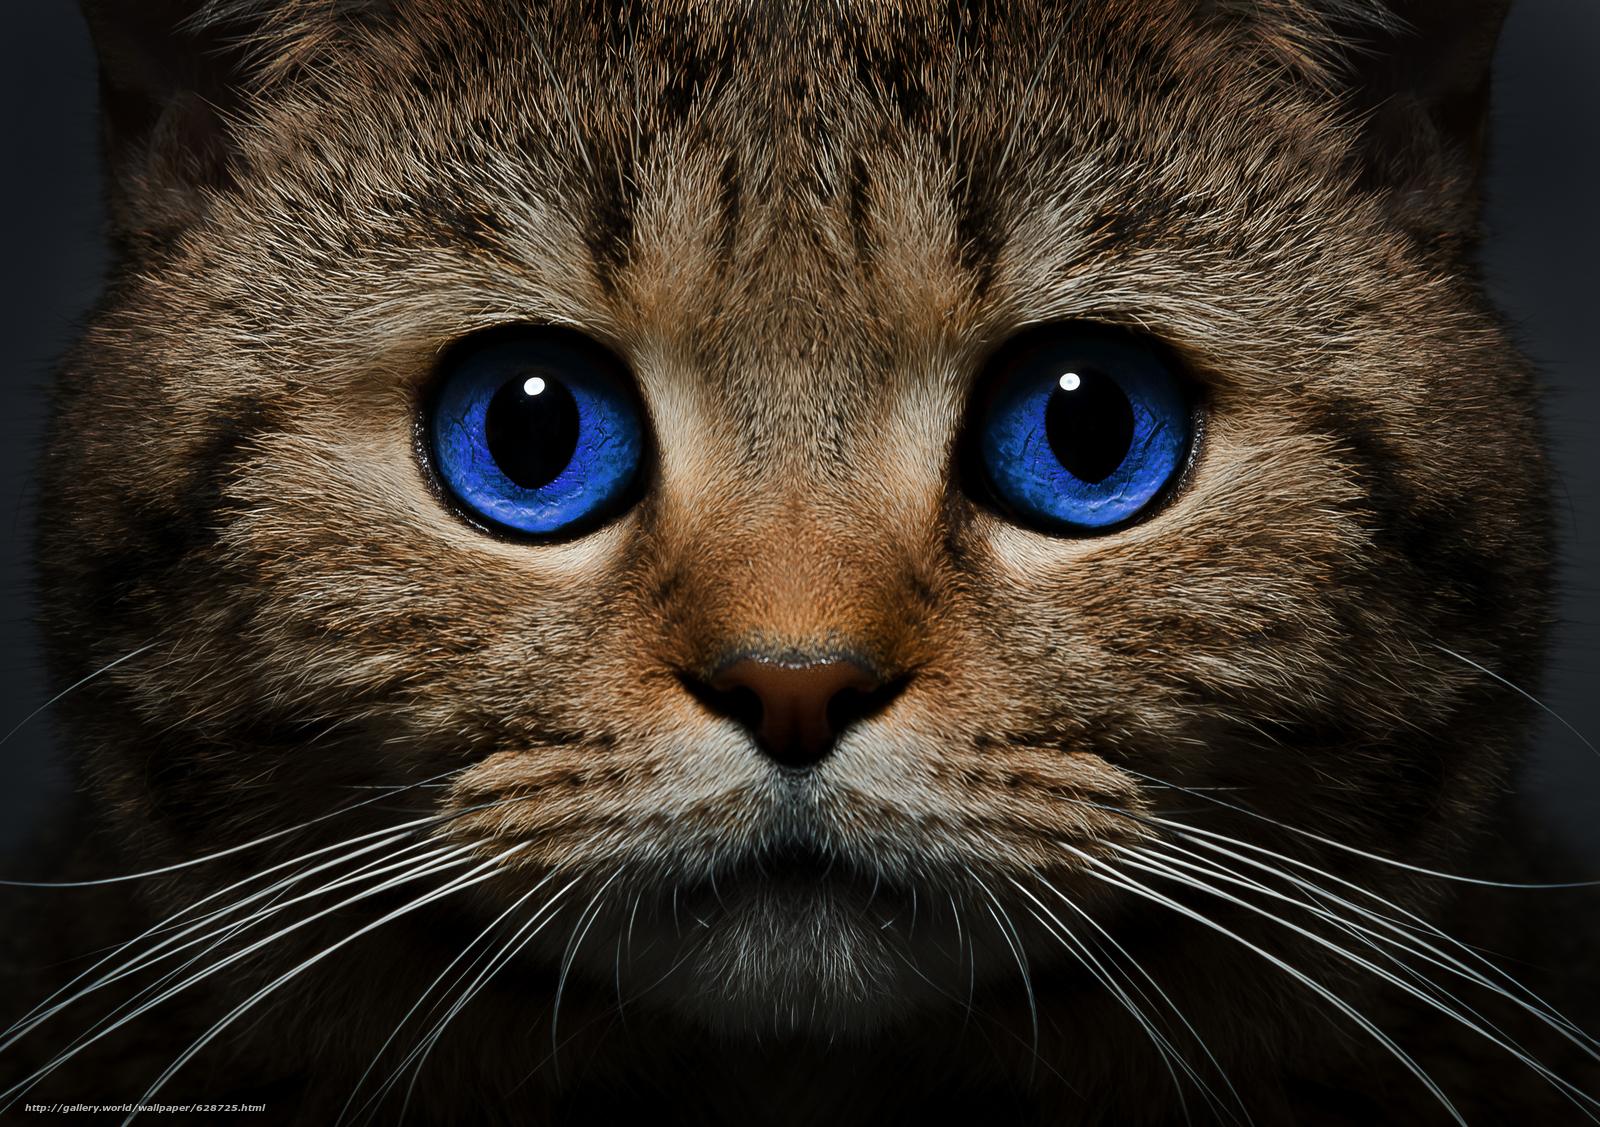 кот, кошка, морда, голубые глаза, взгляд, усы